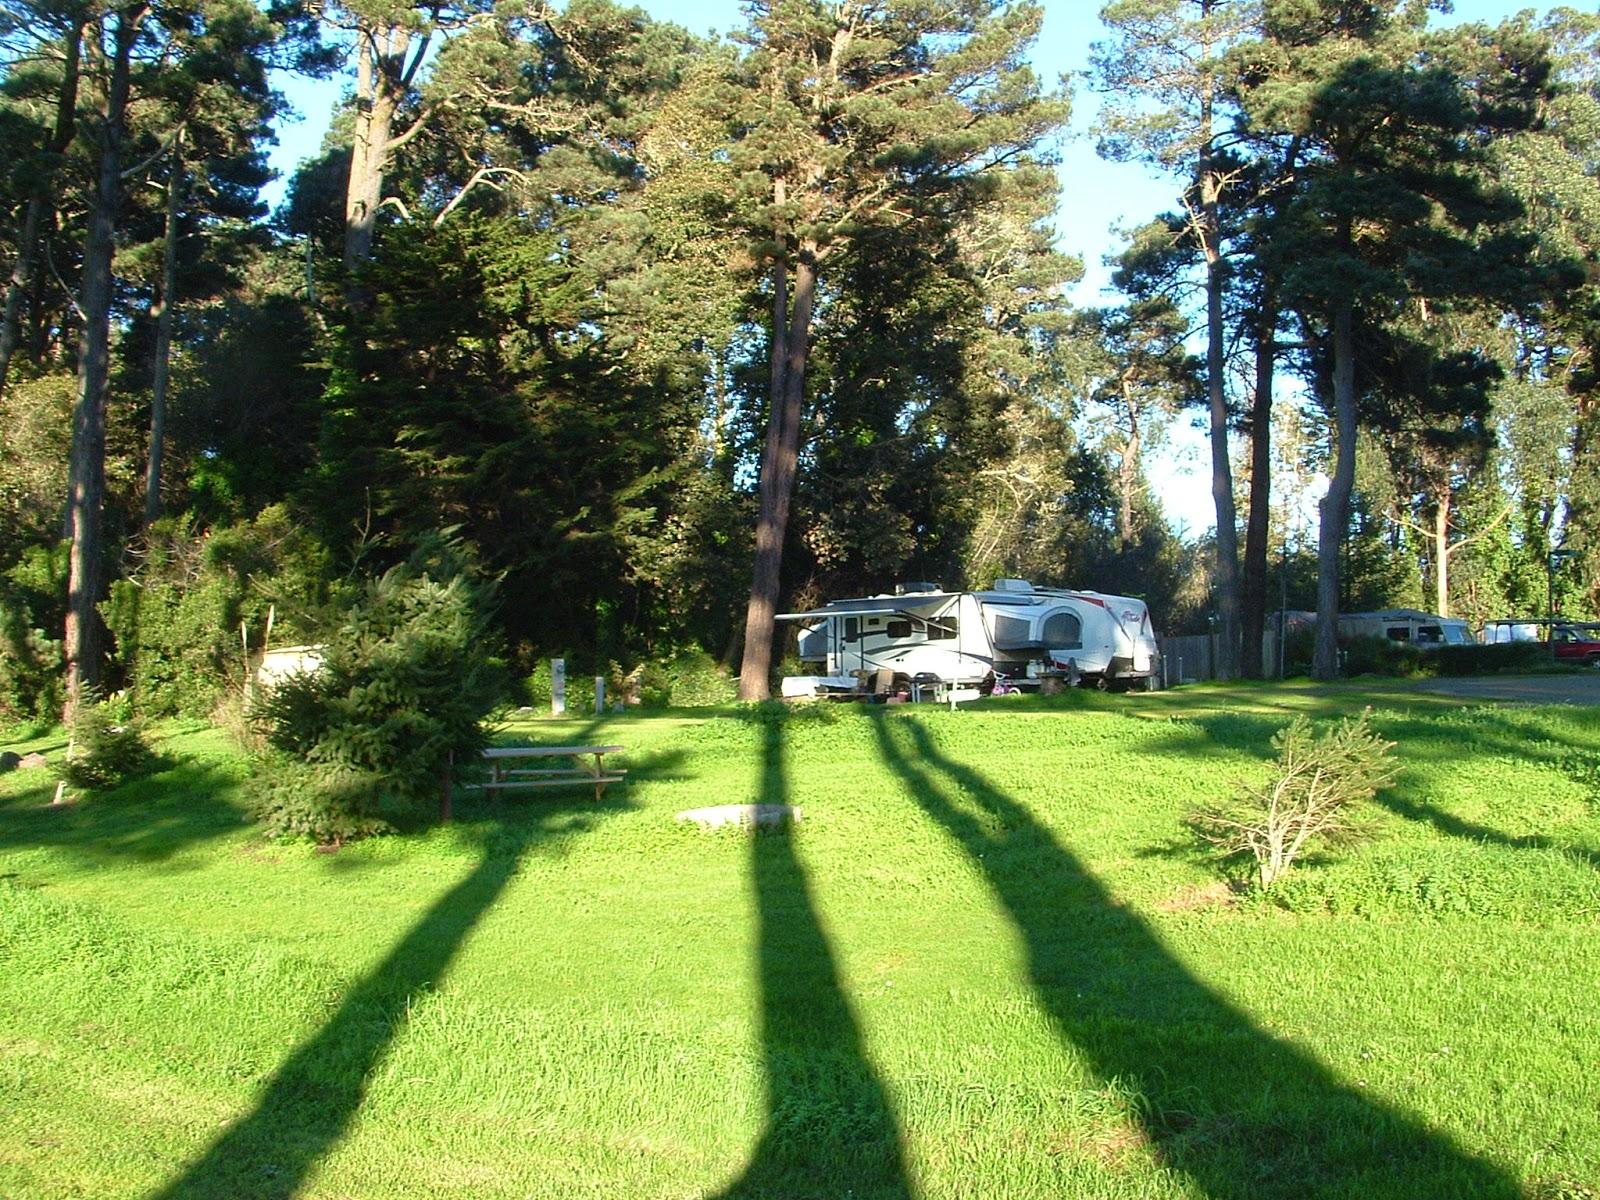 Hidden Pines Rv Park Campground Fort Bragg California Mendocino Botanical Gardens Fort Bragg